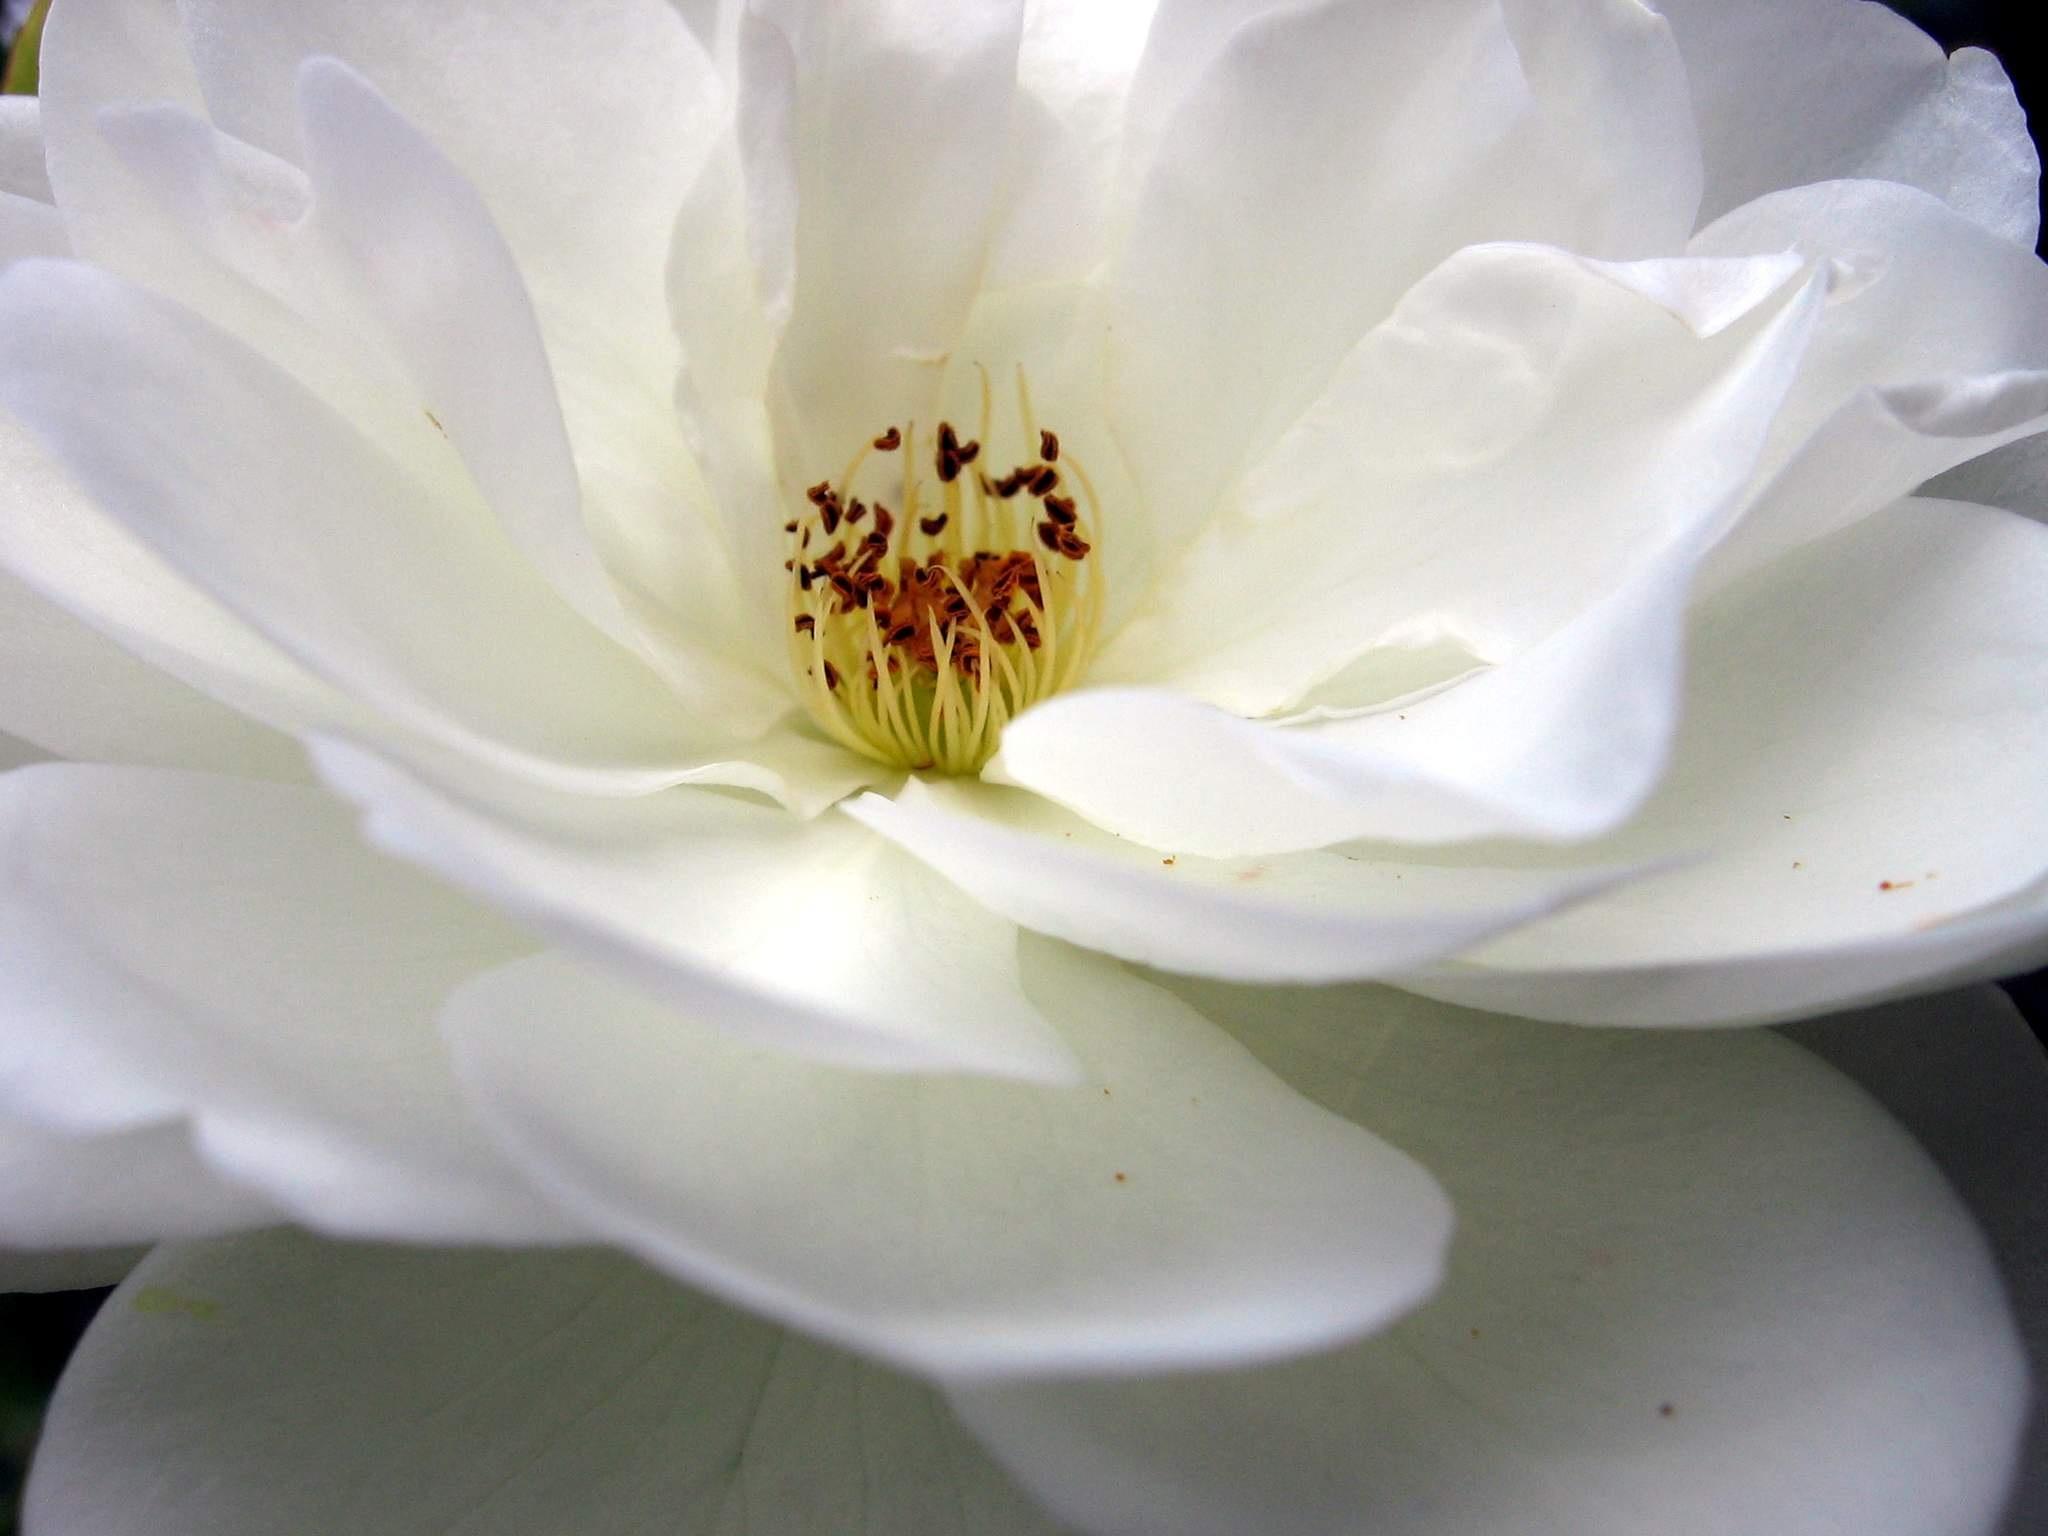 Free Images Nature Blossom Light White Flower Petal Bloom